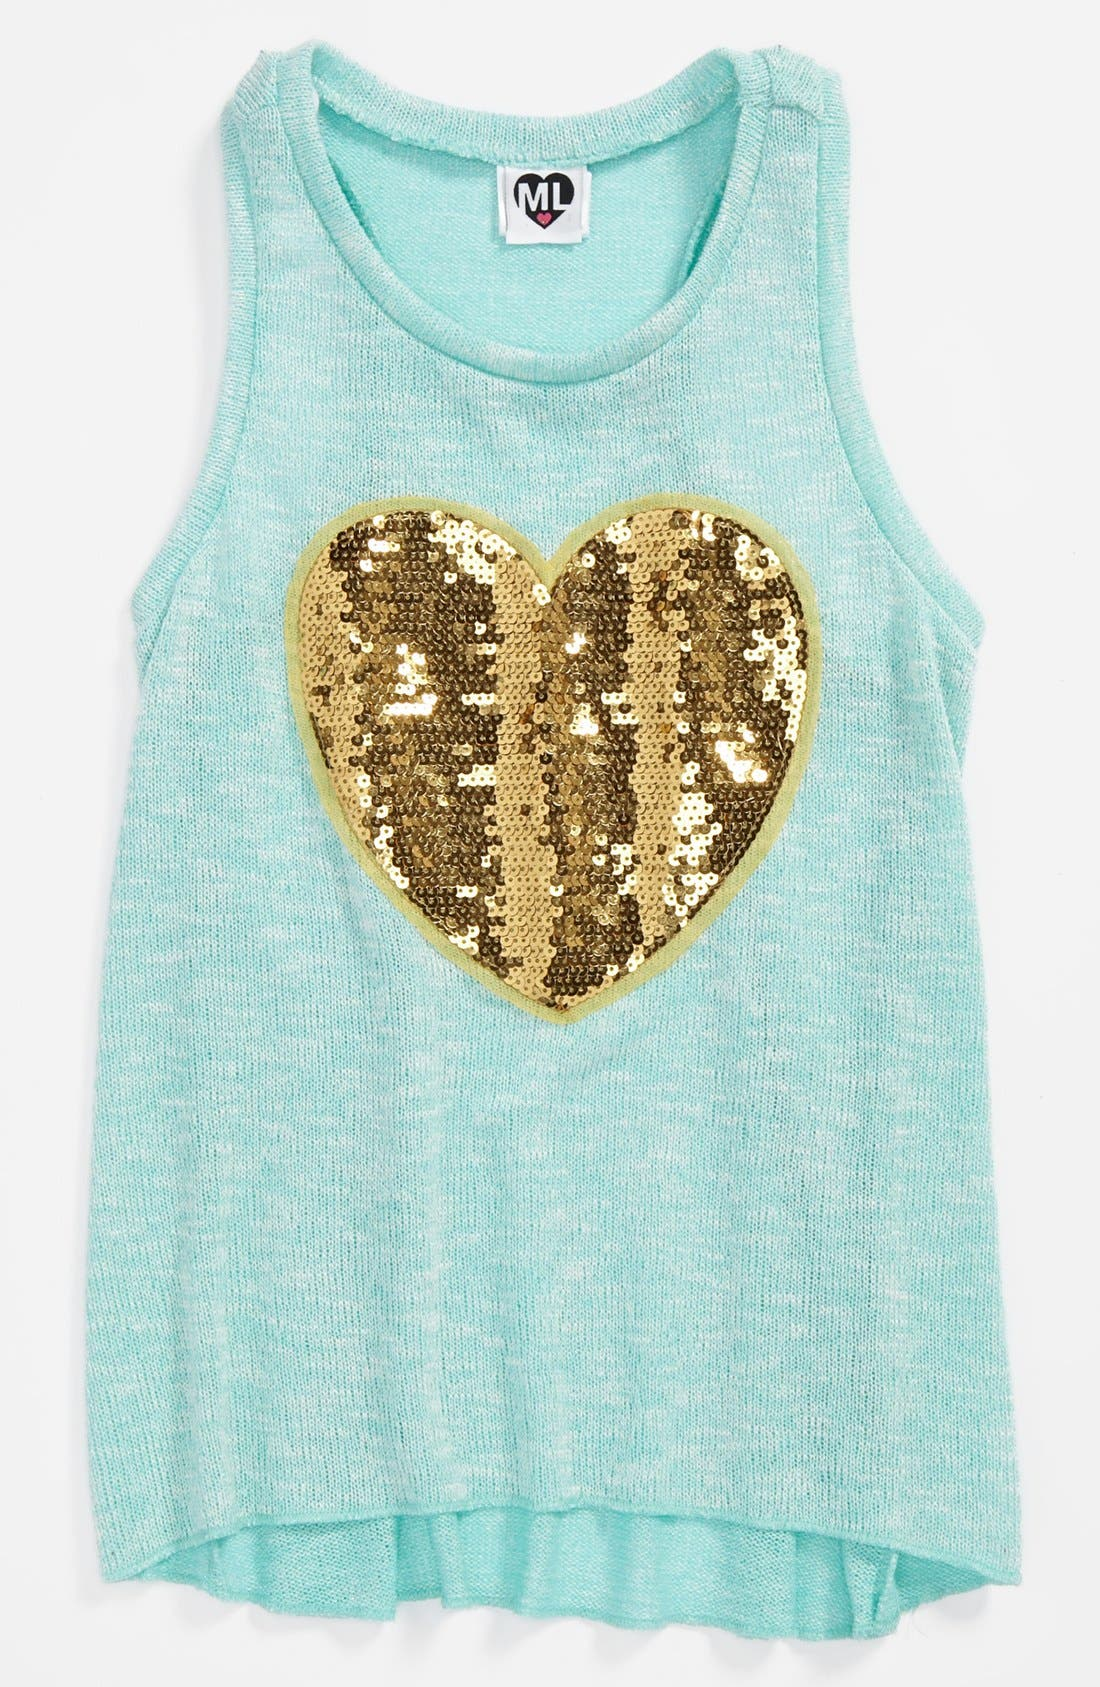 Main Image - Modern Lux Knit Tank Top (Big Girls)